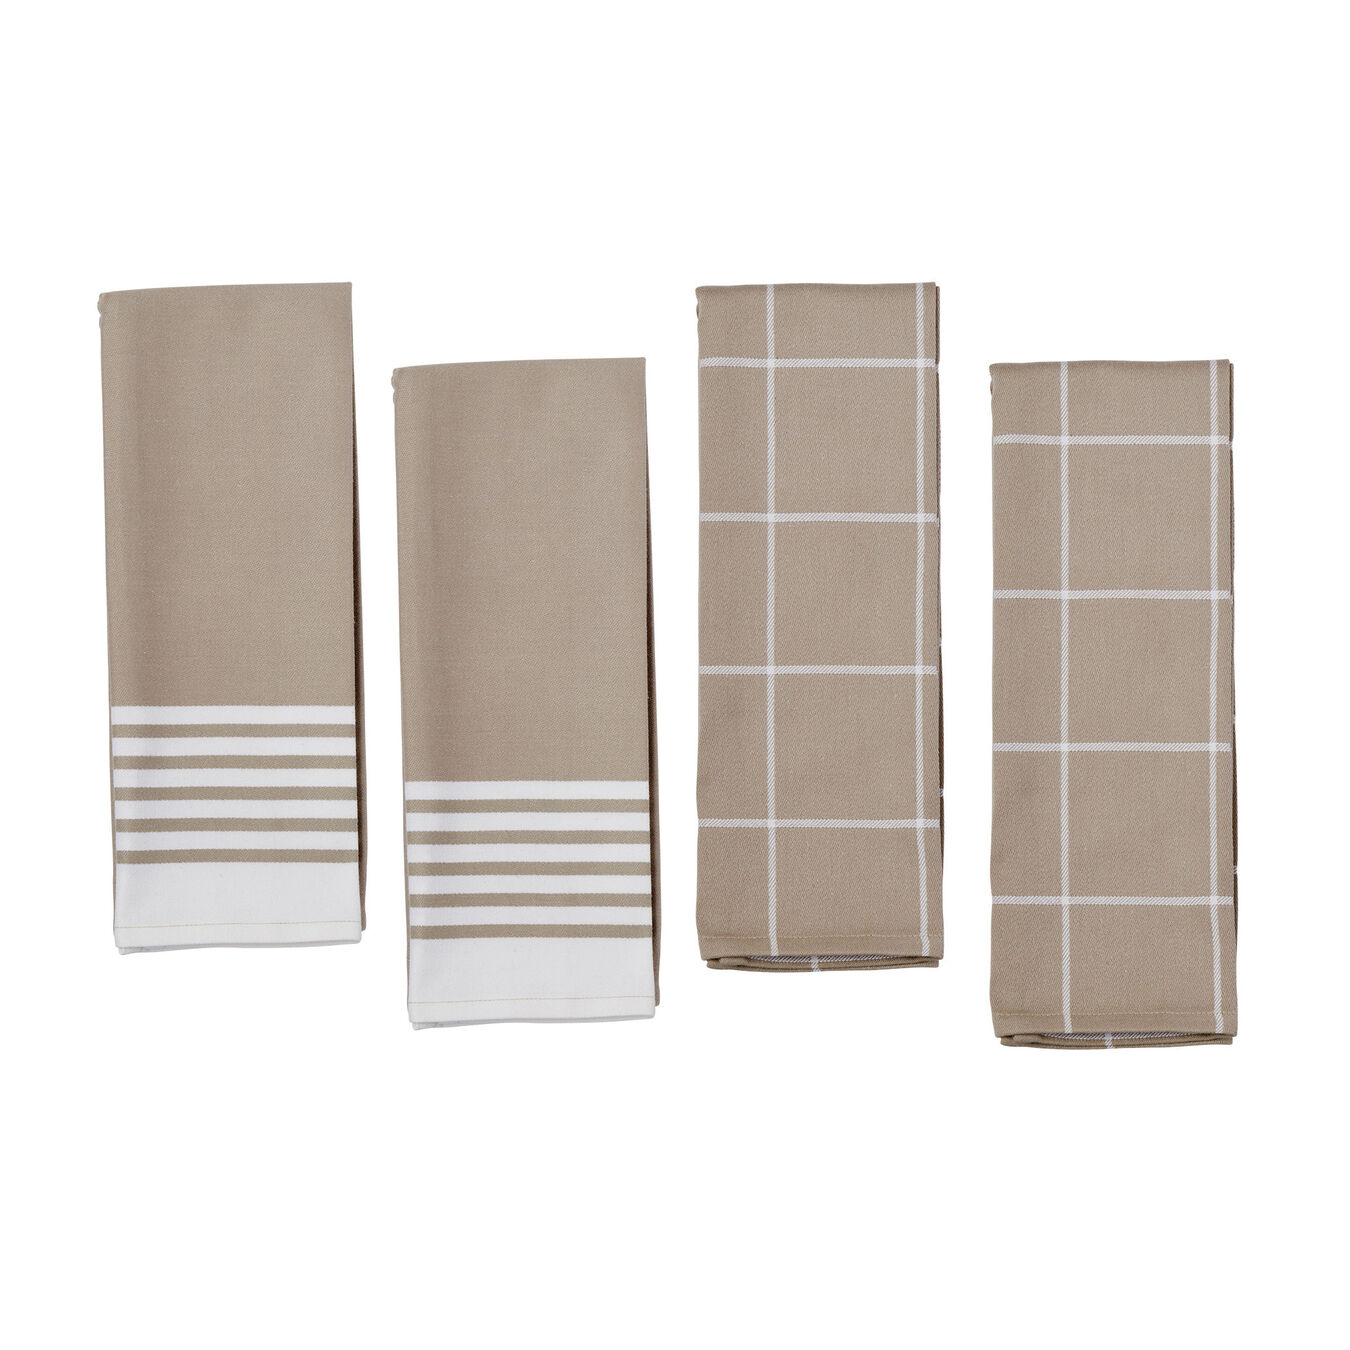 4-pc Kitchen Towel Set - Taupe,,large 1